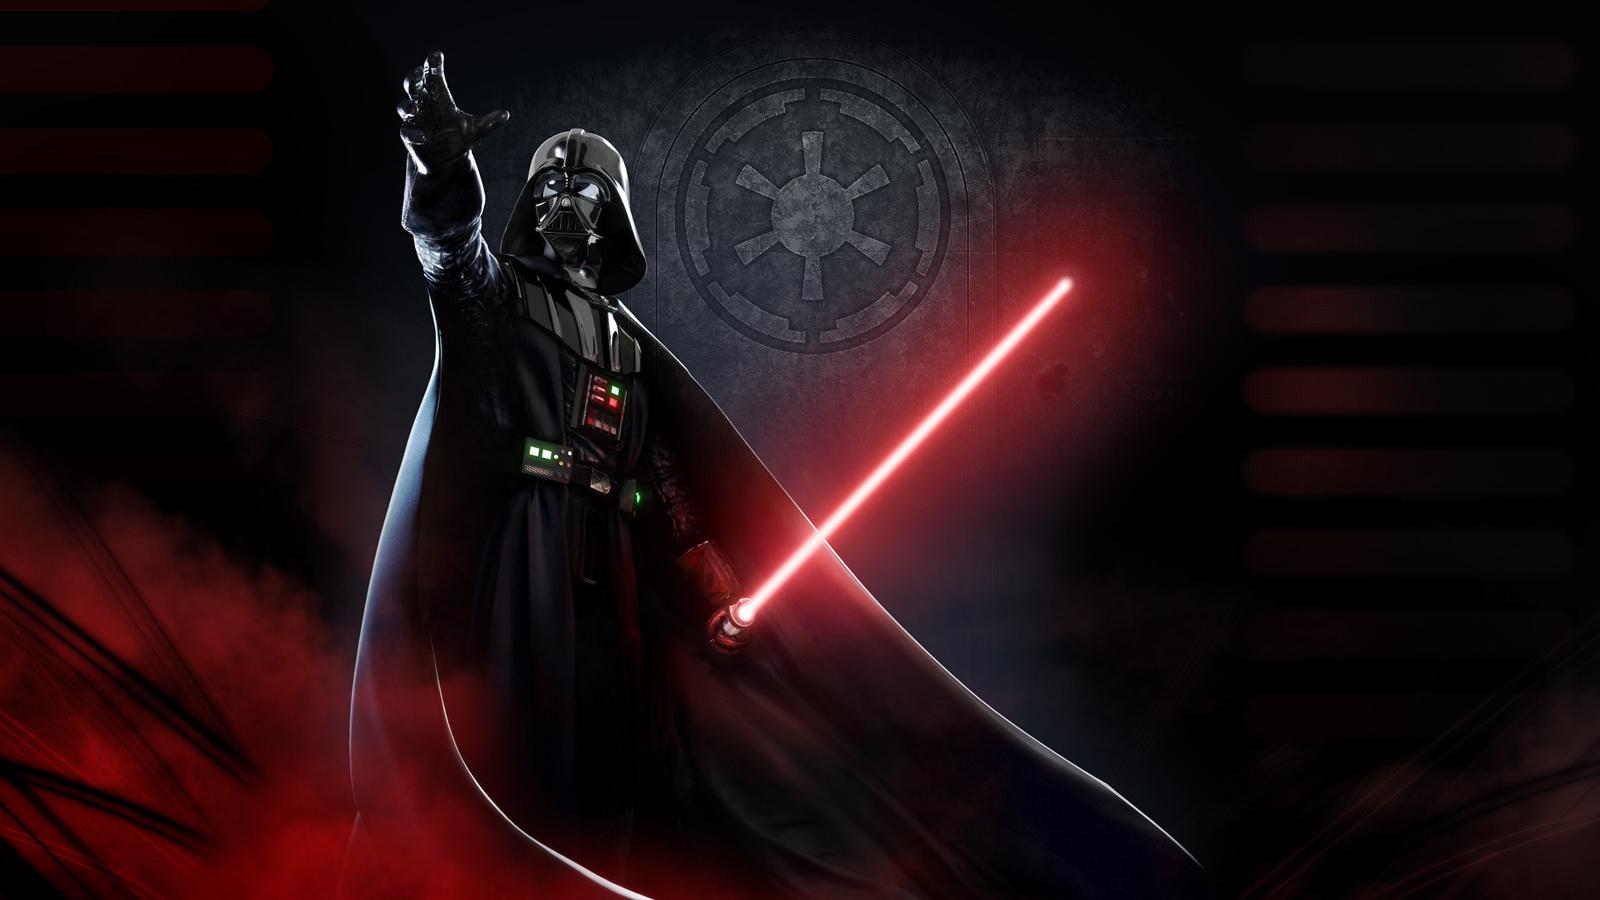 Star wars 35 wallpapers hd taringa for Fondo de pantalla star wars